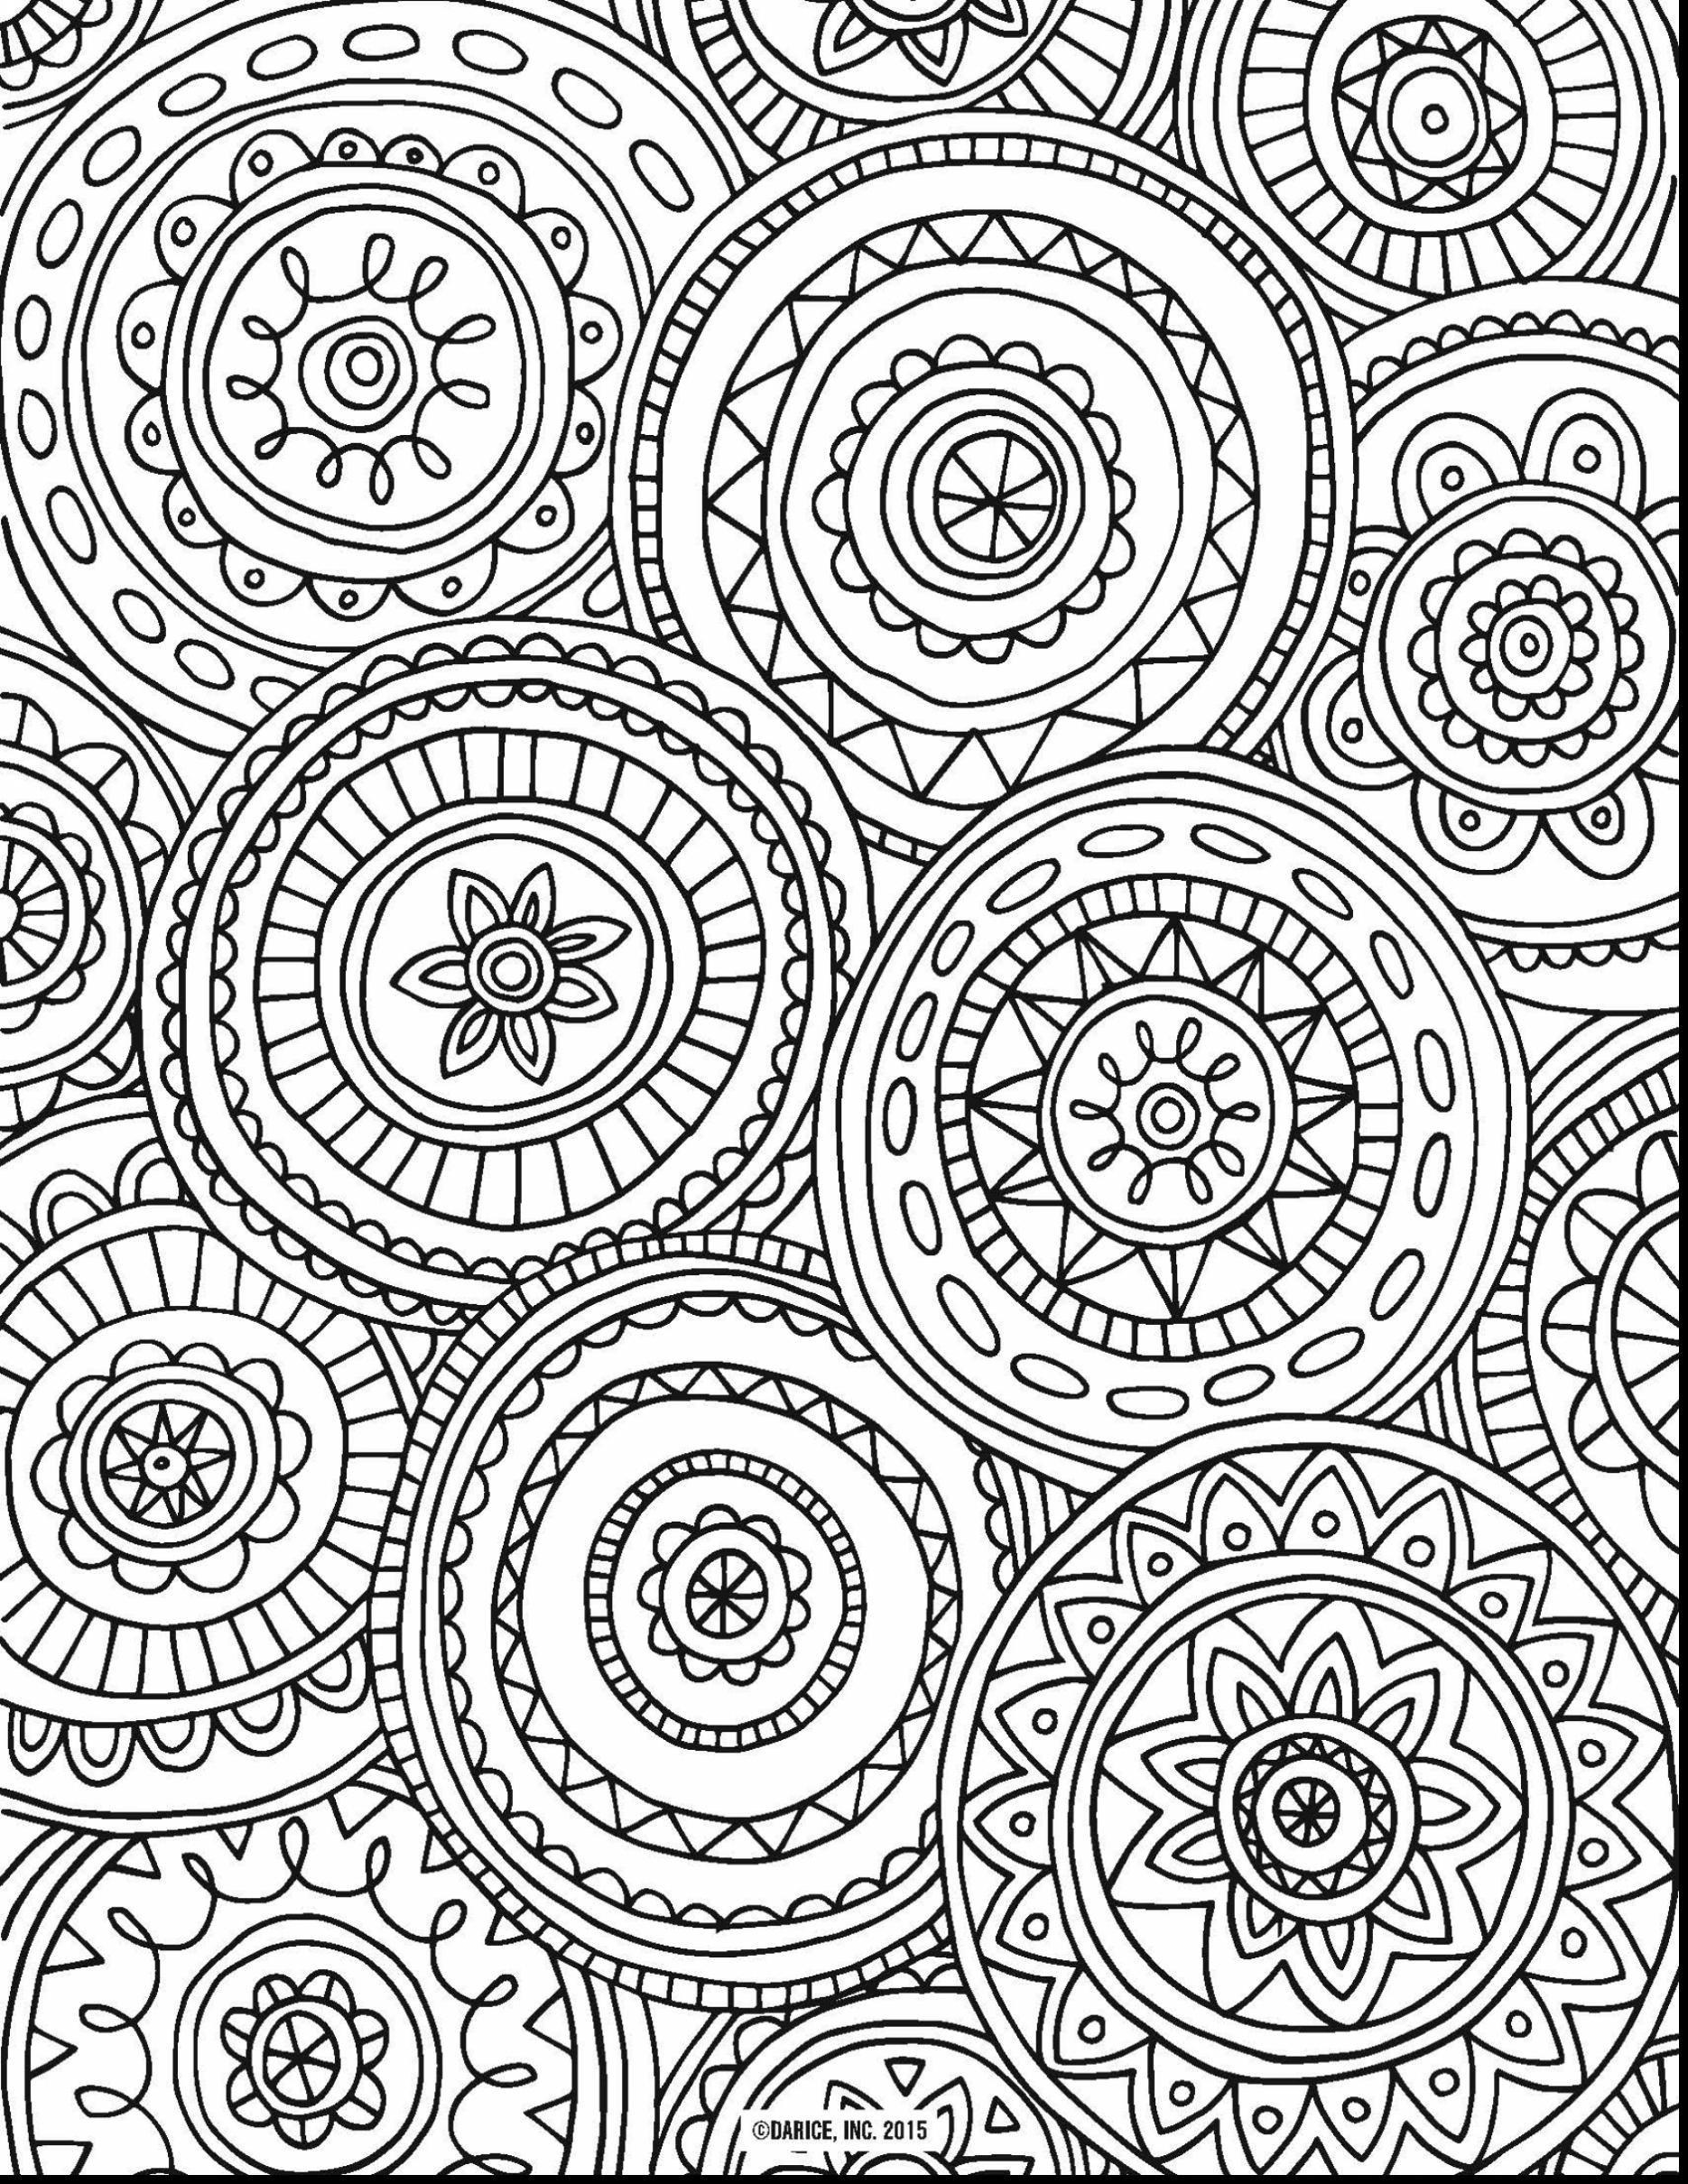 Luxury Mandala Coloring Sheets Jvzooreview